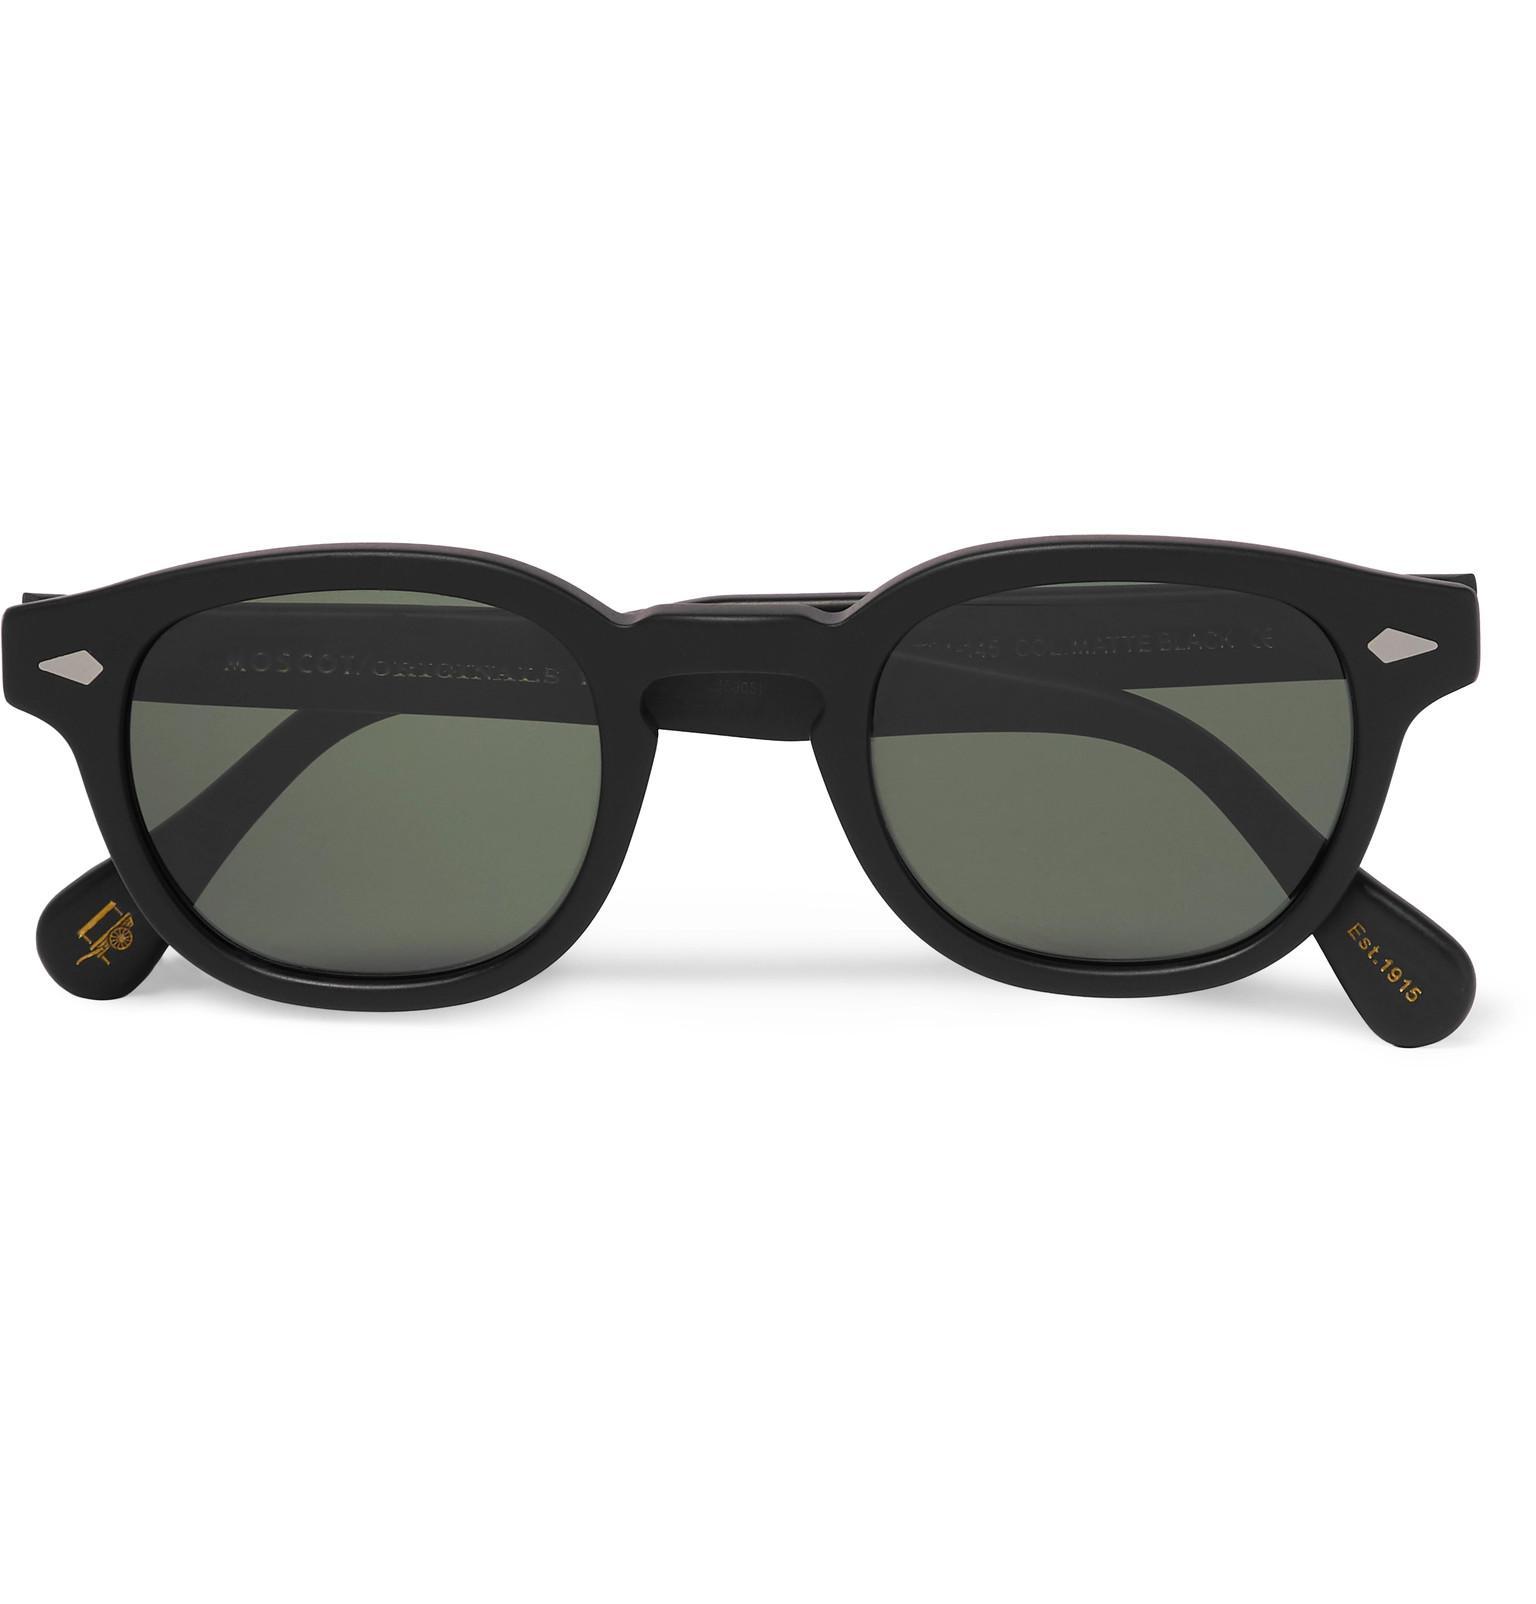 aabd5961b76 Lyst - Moscot Lemtosh Round-frame Matte-acetate Sunglasses in Black ...